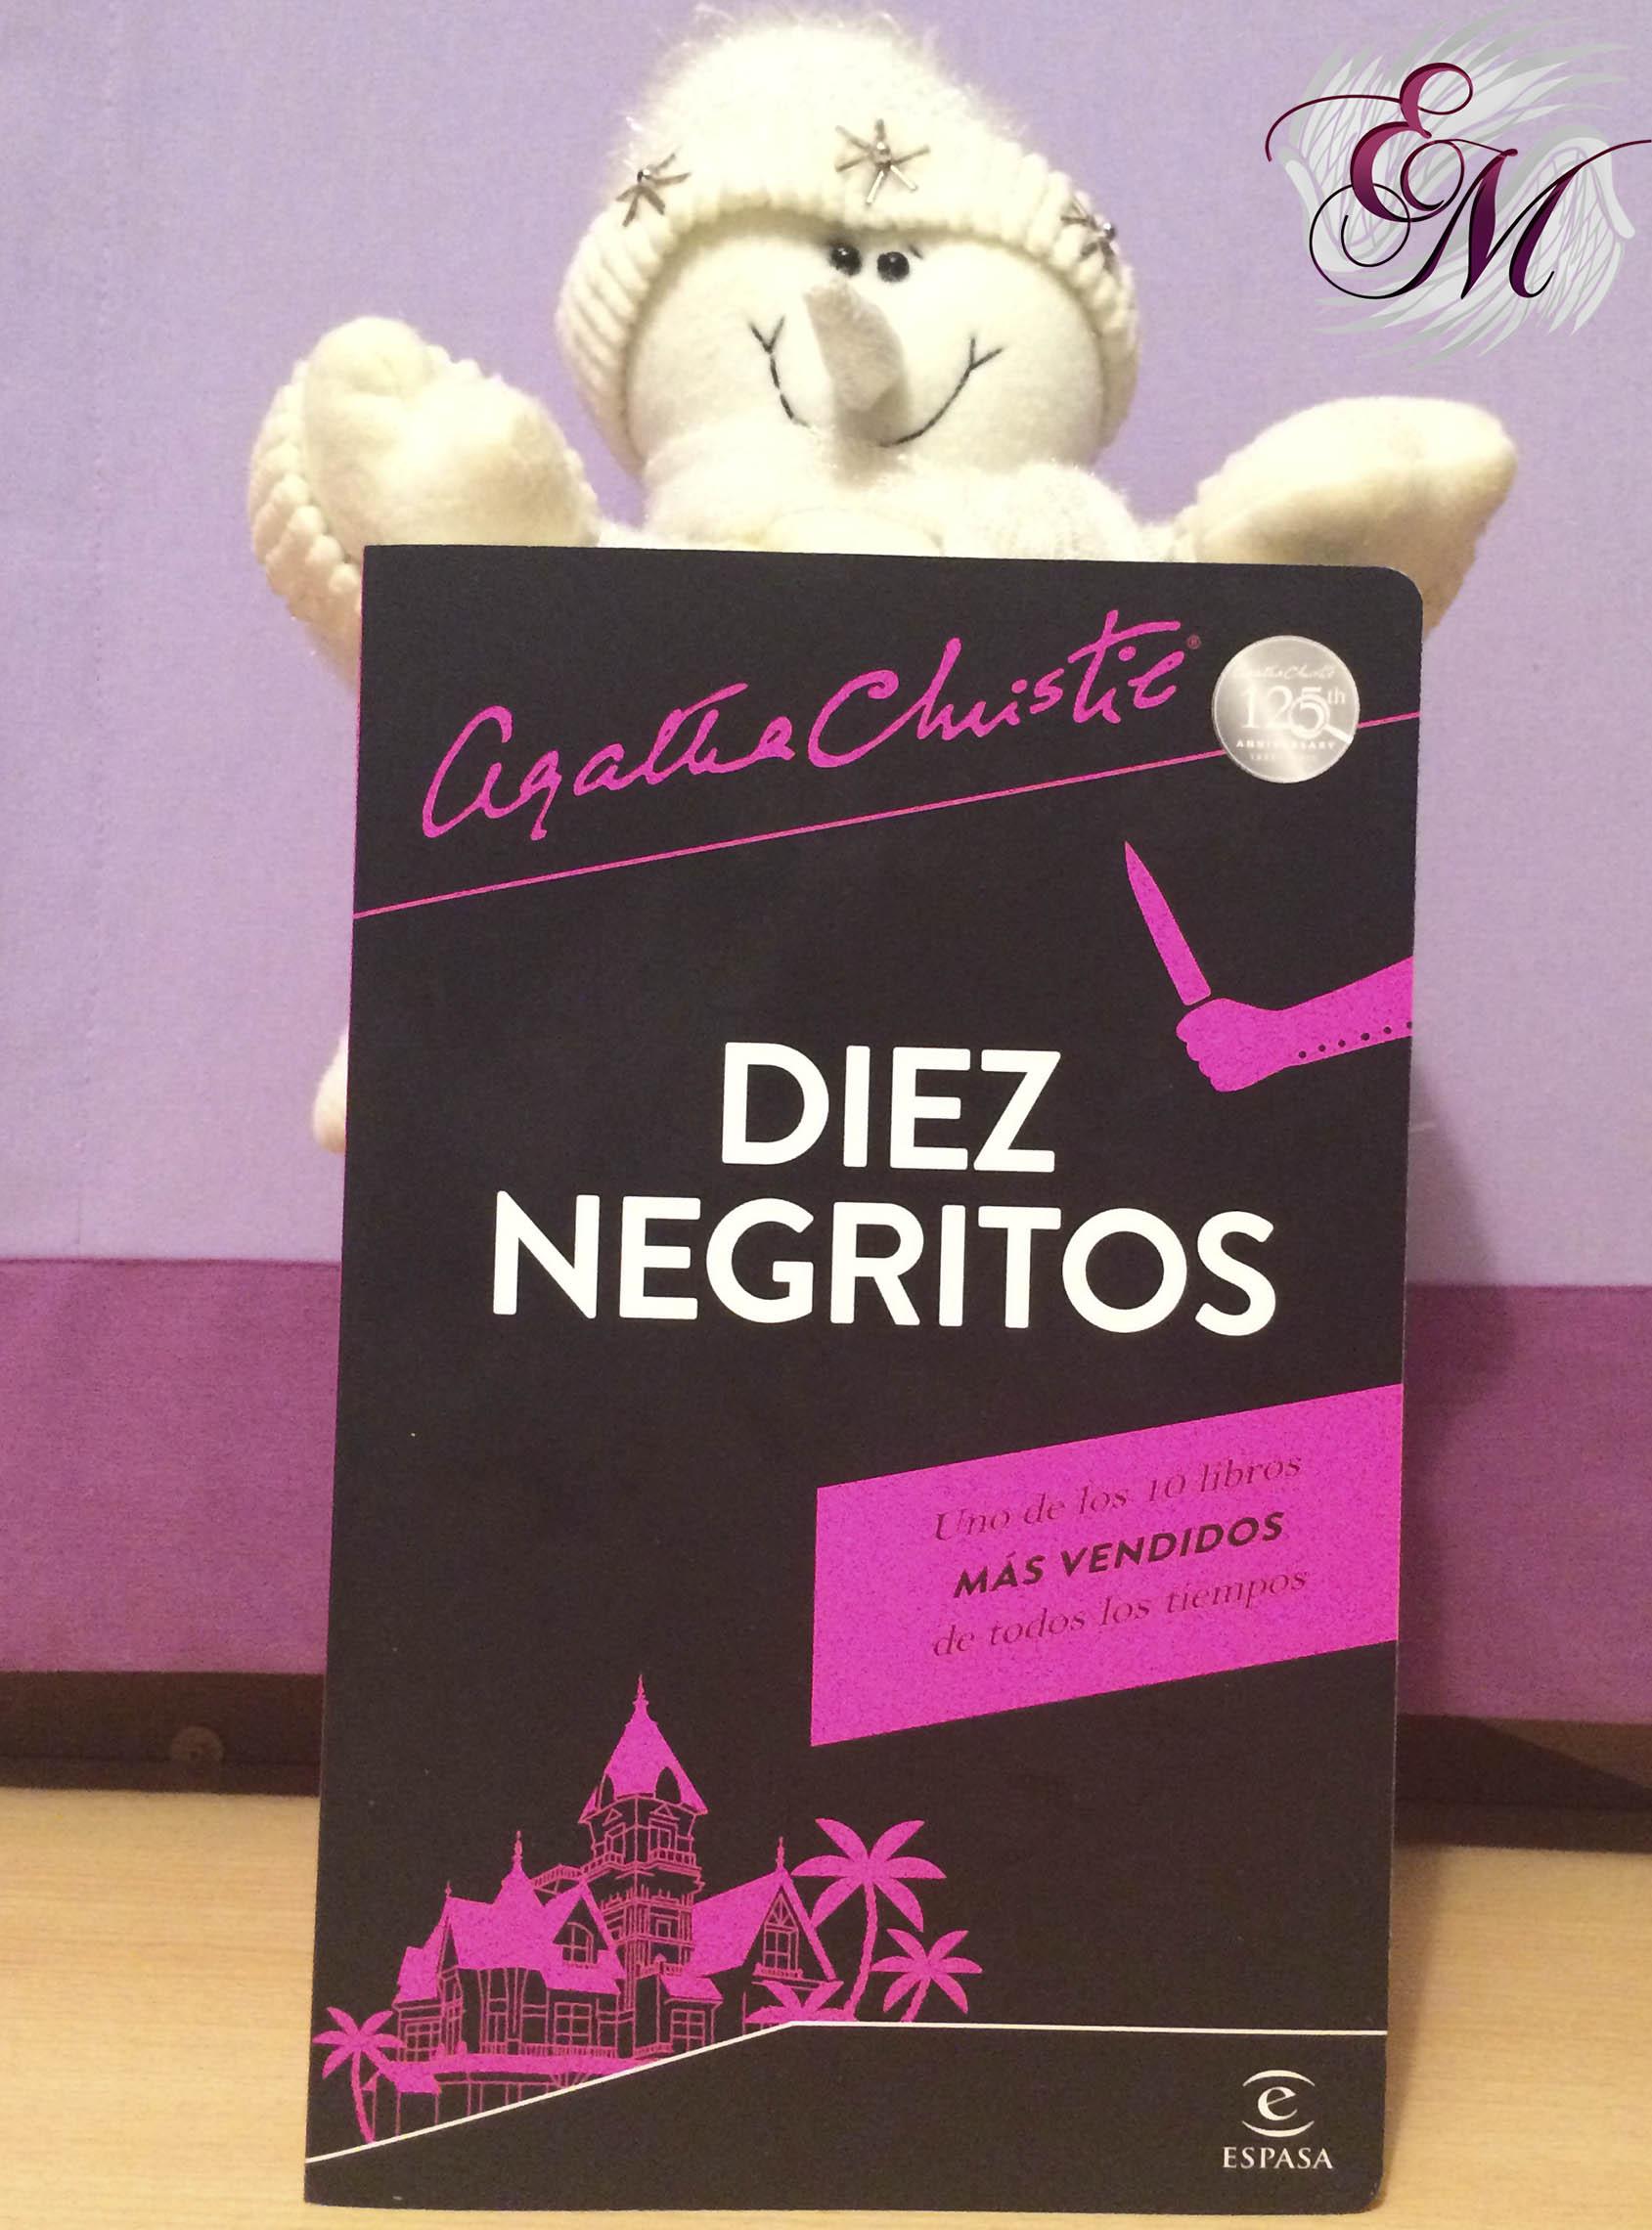 Diez negritos, de Agatha Christie - Reseña